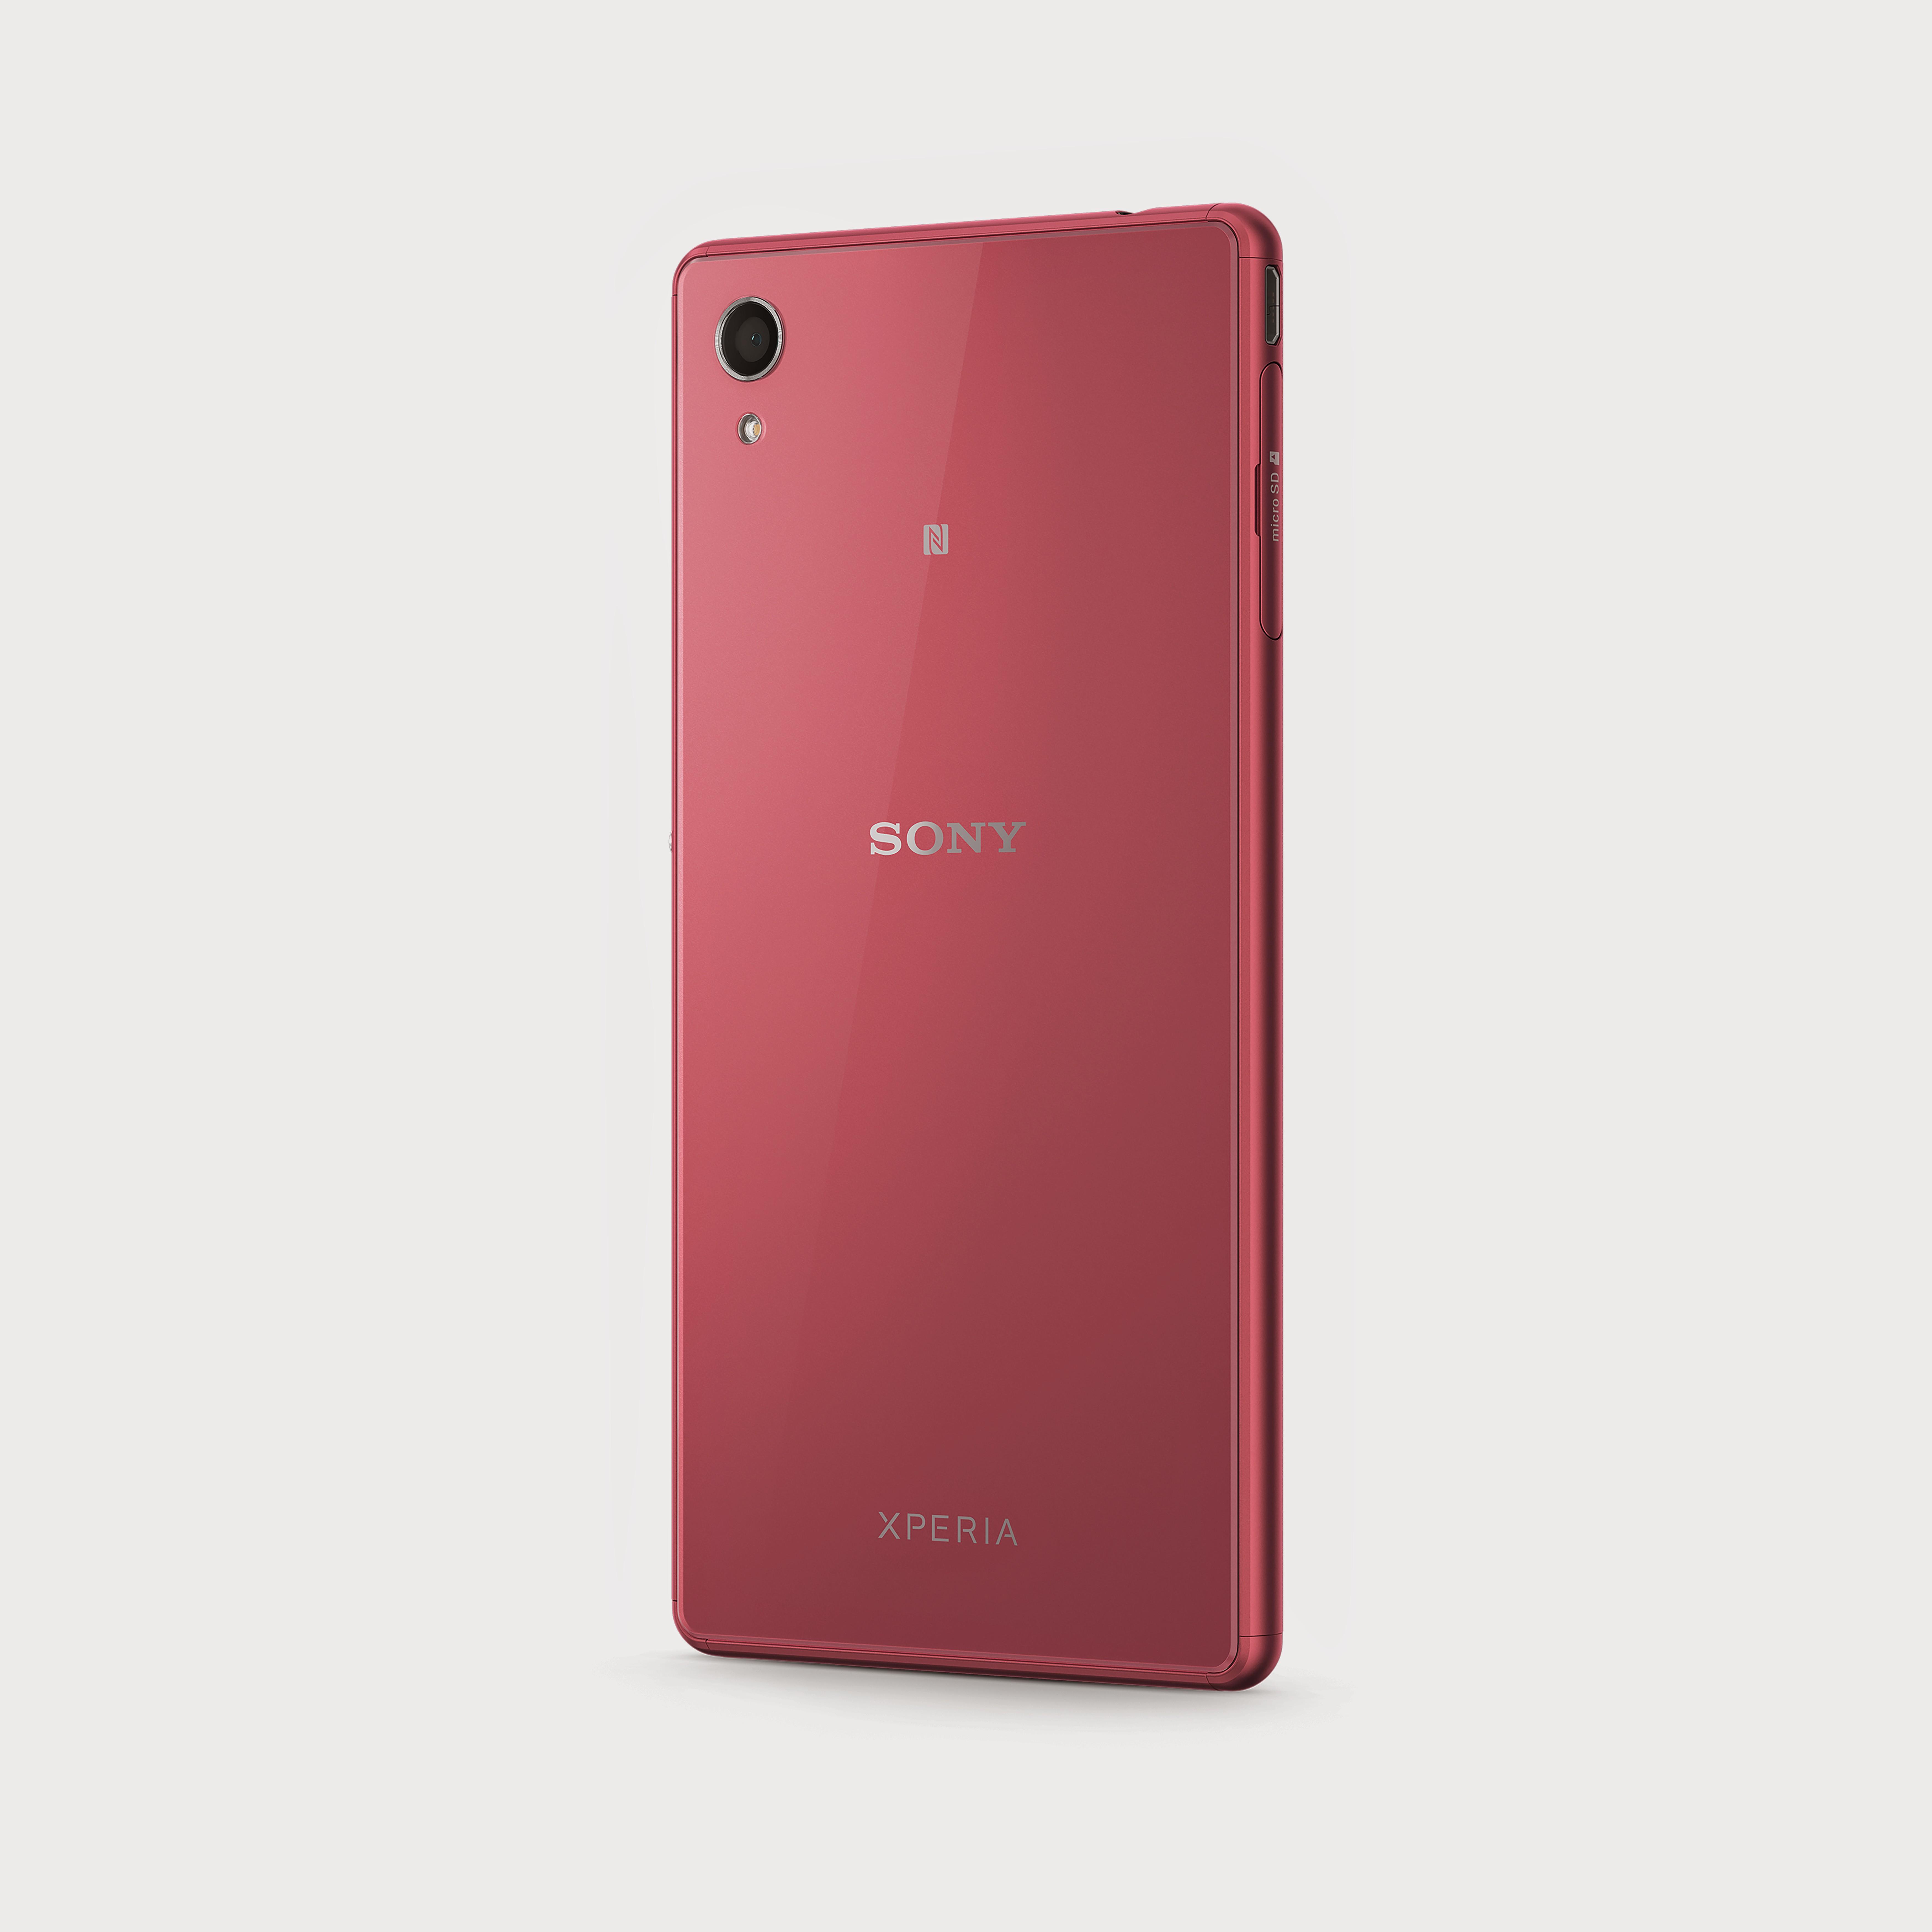 Sony Xperia M4 Aqua Mittelklasse Smartphone Mit Octa Core Prozessor Front 4